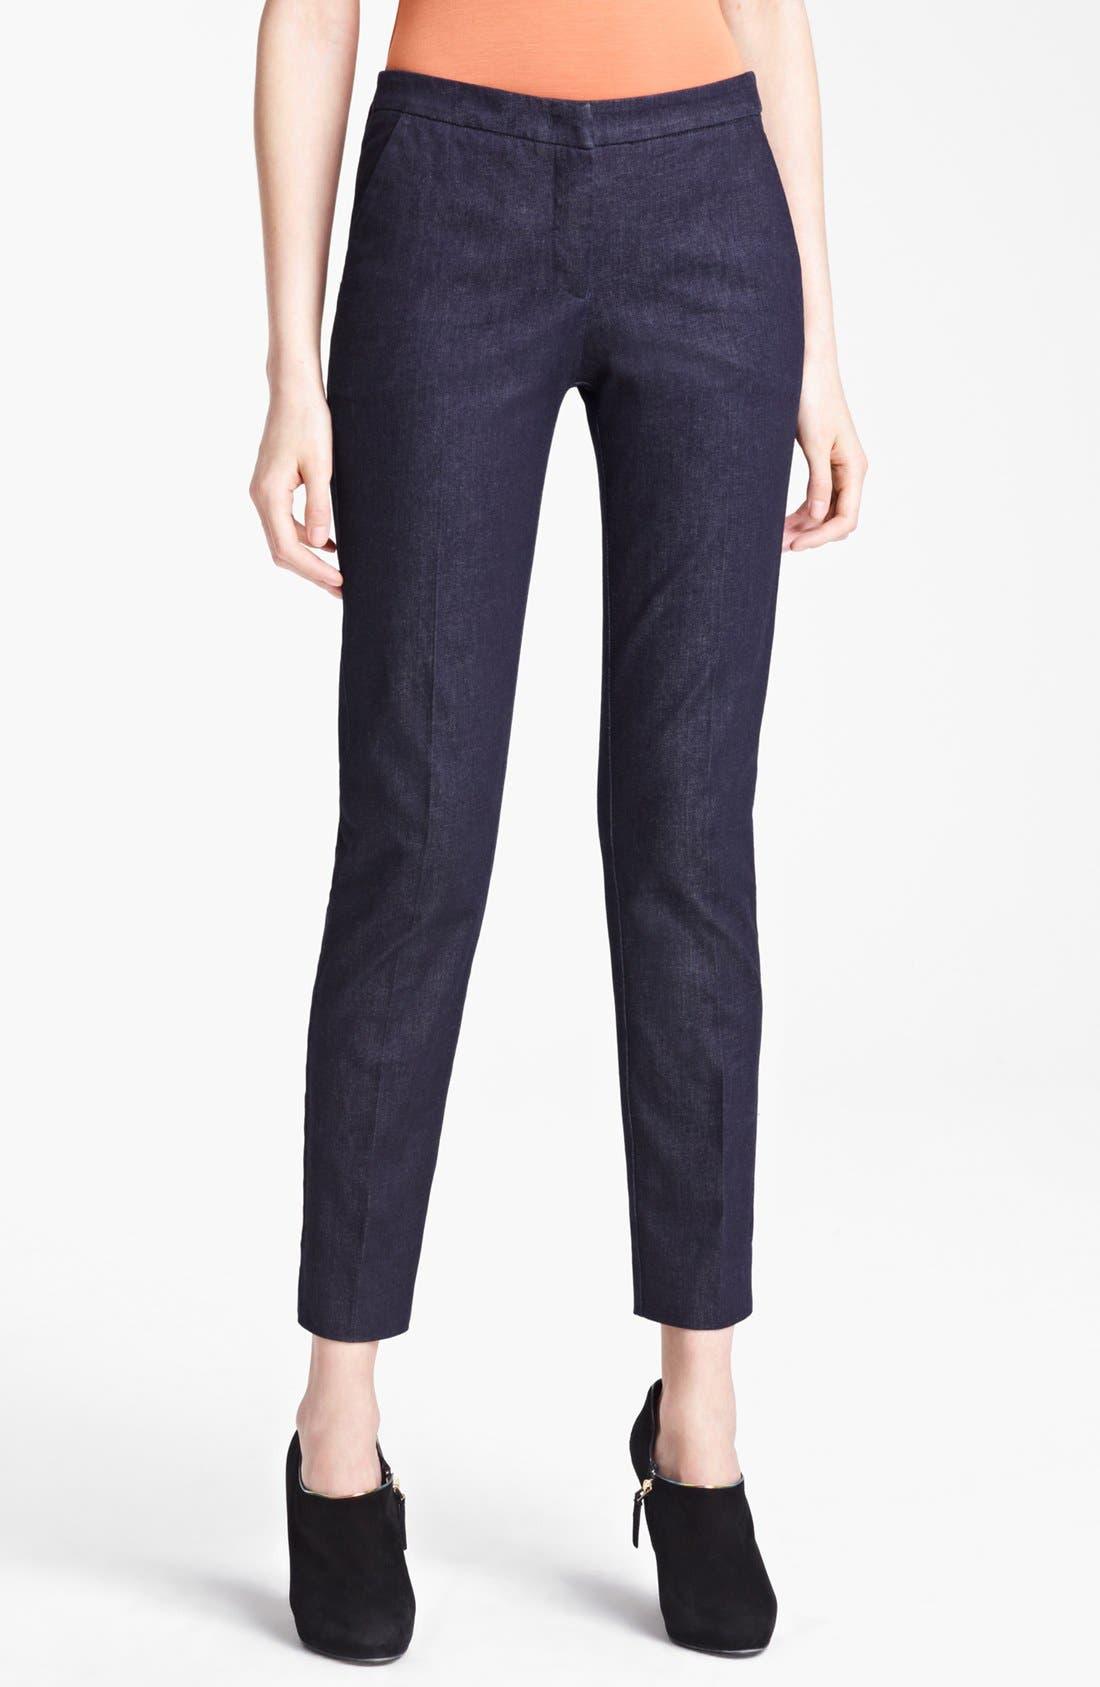 Alternate Image 1 Selected - Armani Collezioni Narrow Leg Stretch Jeans